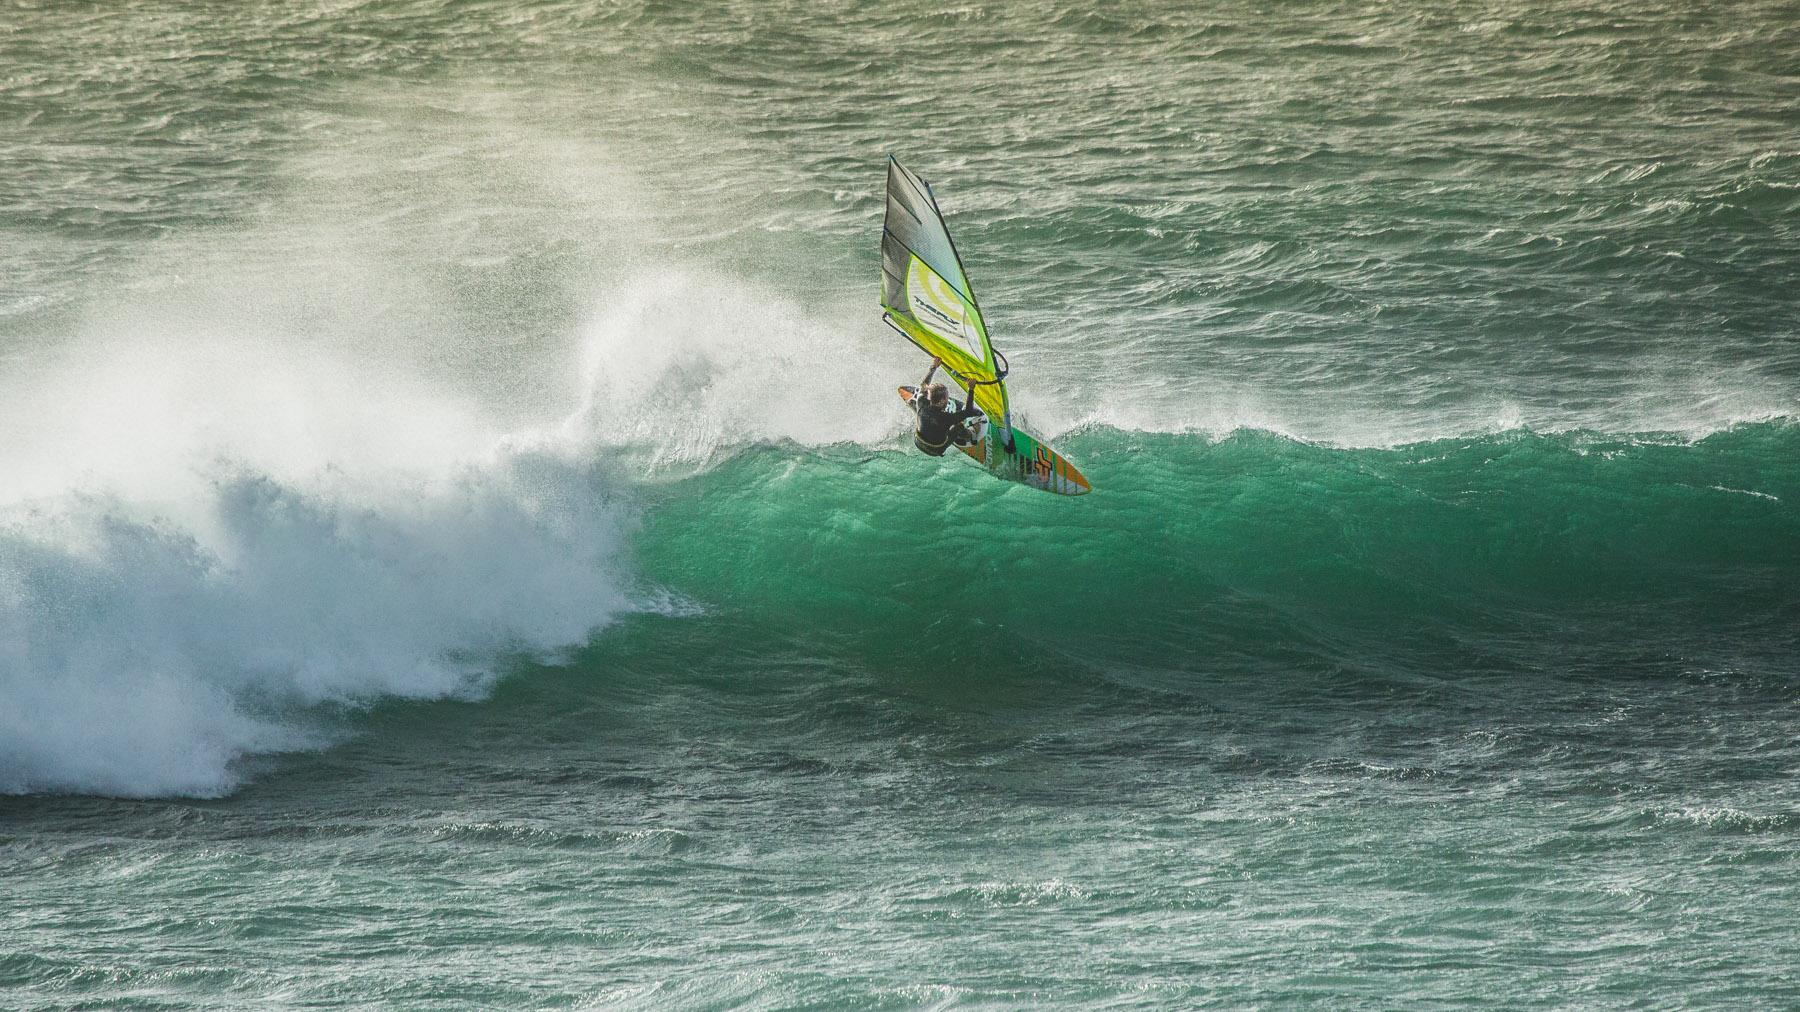 alastair mcleod windsurfing cat bay phillip island